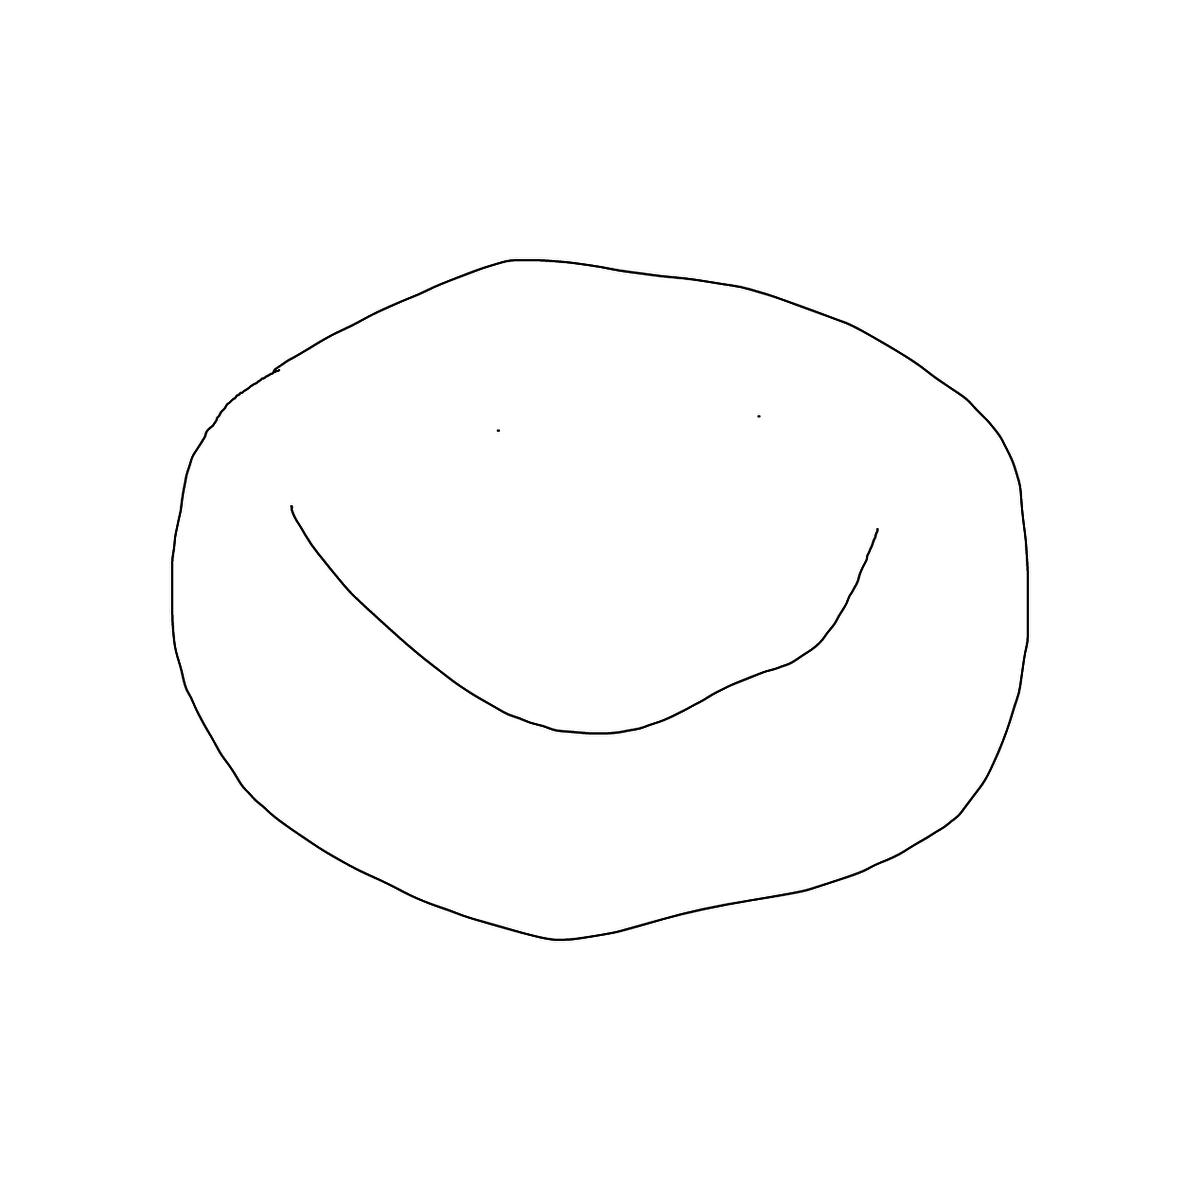 BAAAM drawing#145 lat:37.9163017272949200lng: -84.4821166992187500